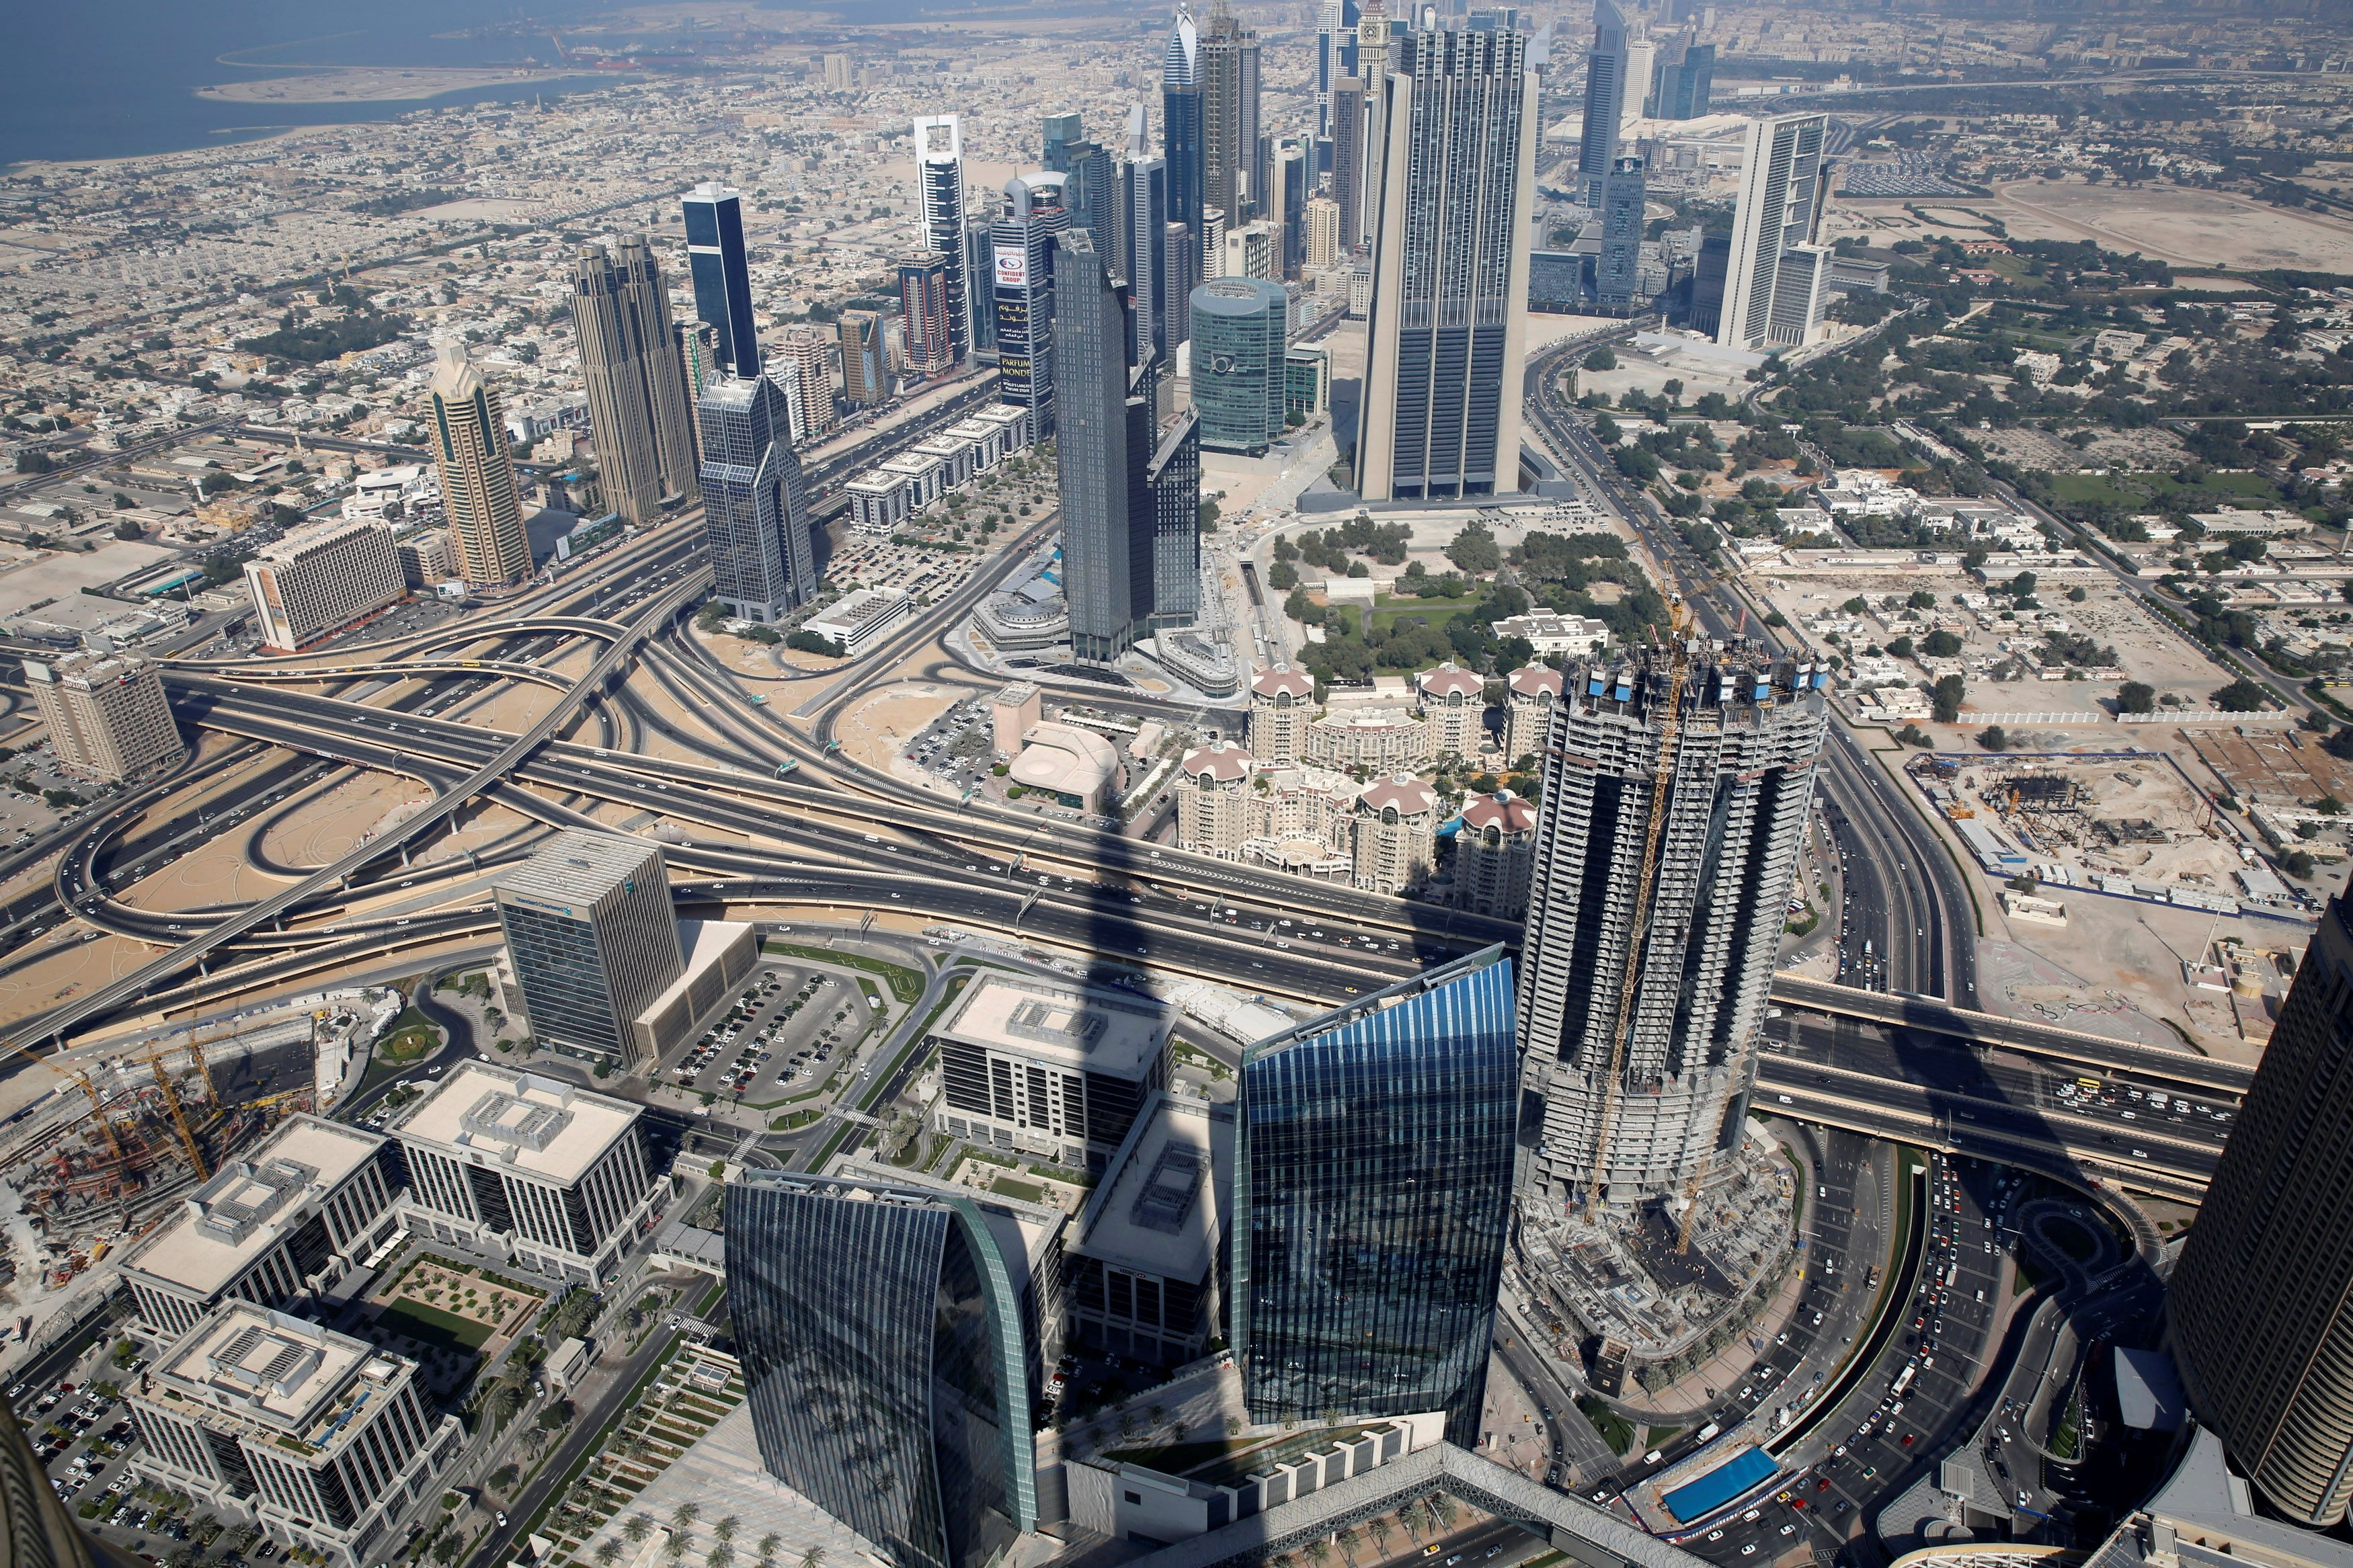 An aerial view of Dubai from Burj Khalifa, the tallest building in the world, in Dubai November 19, 2014. REUTERS/Ahmed Jadallah